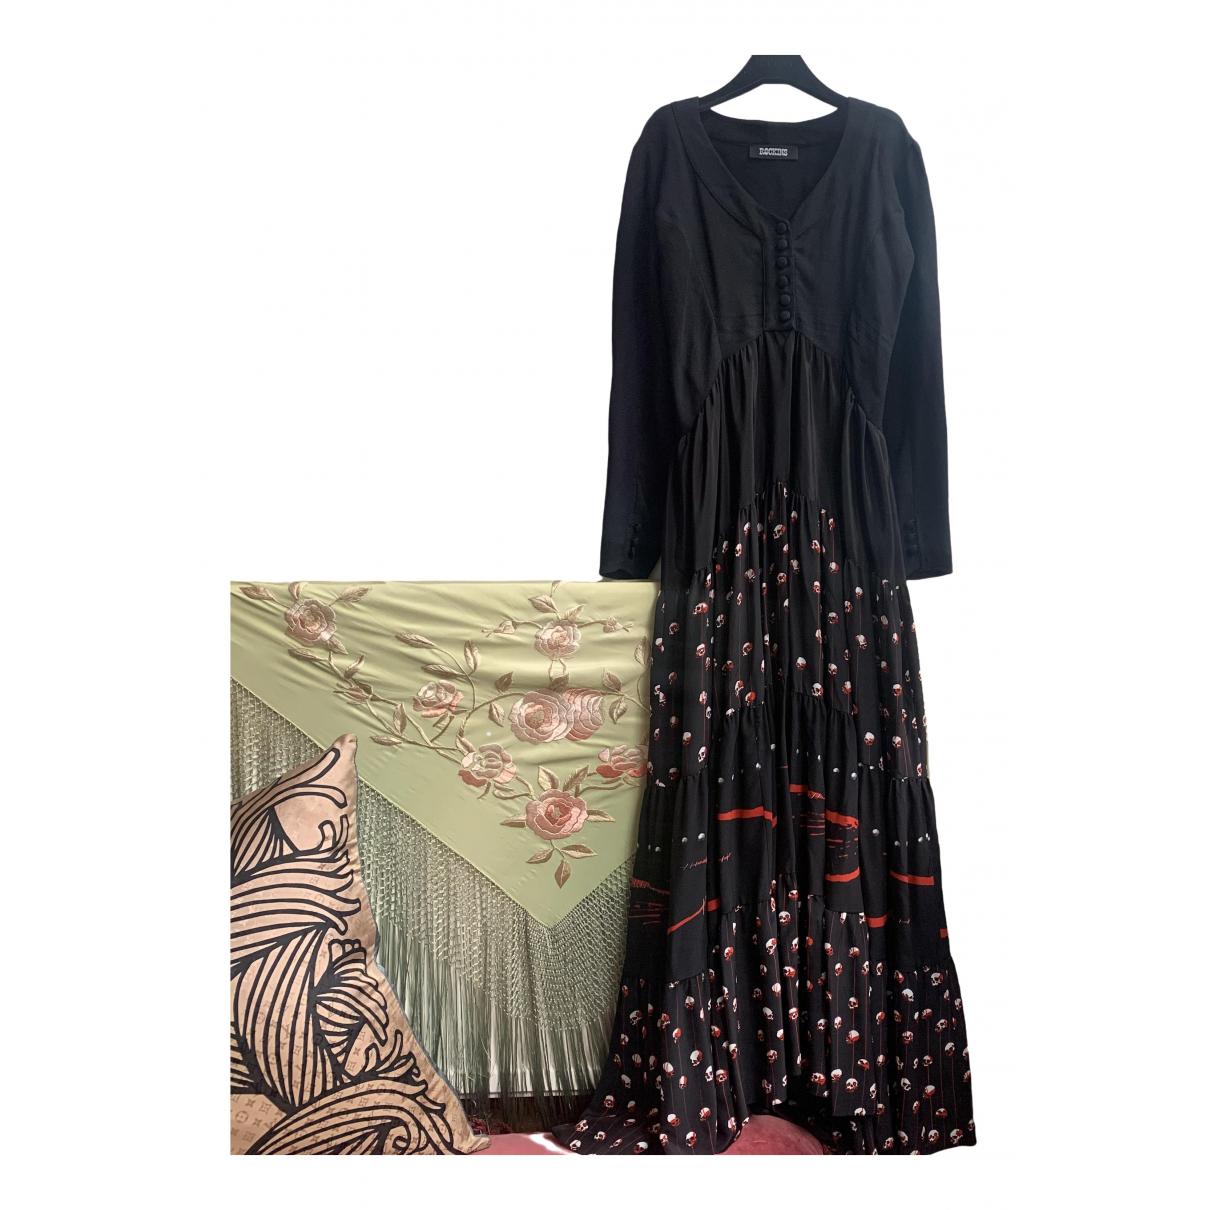 Rockins \N Kleid in  Schwarz Viskose